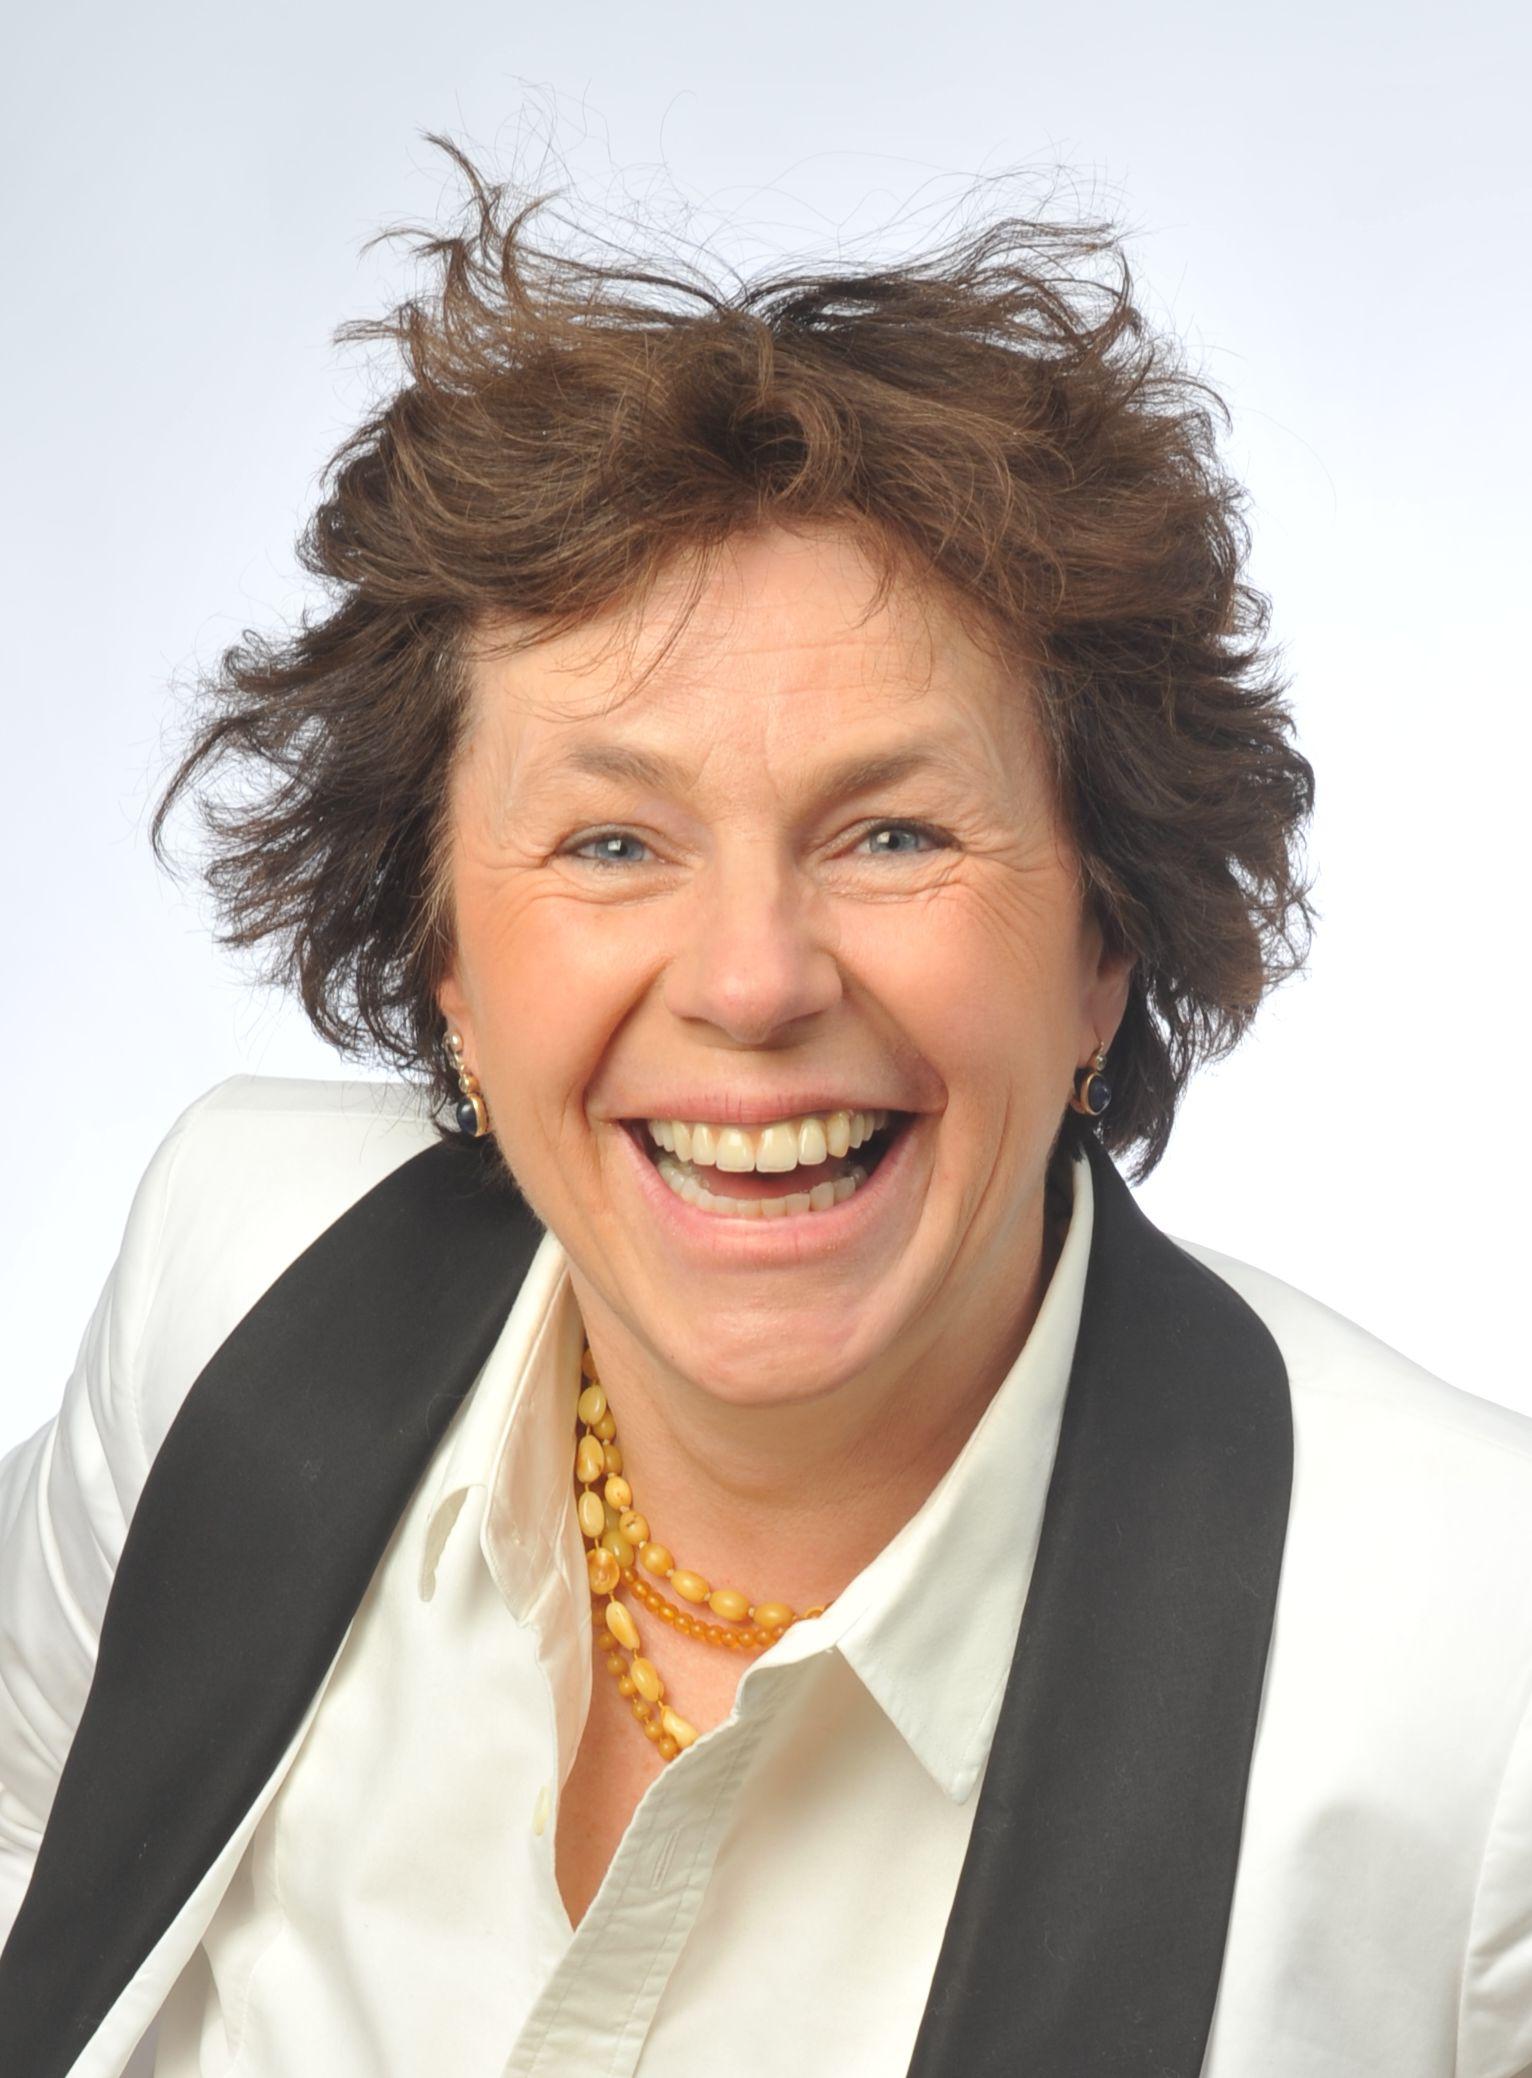 Margie Kinsky